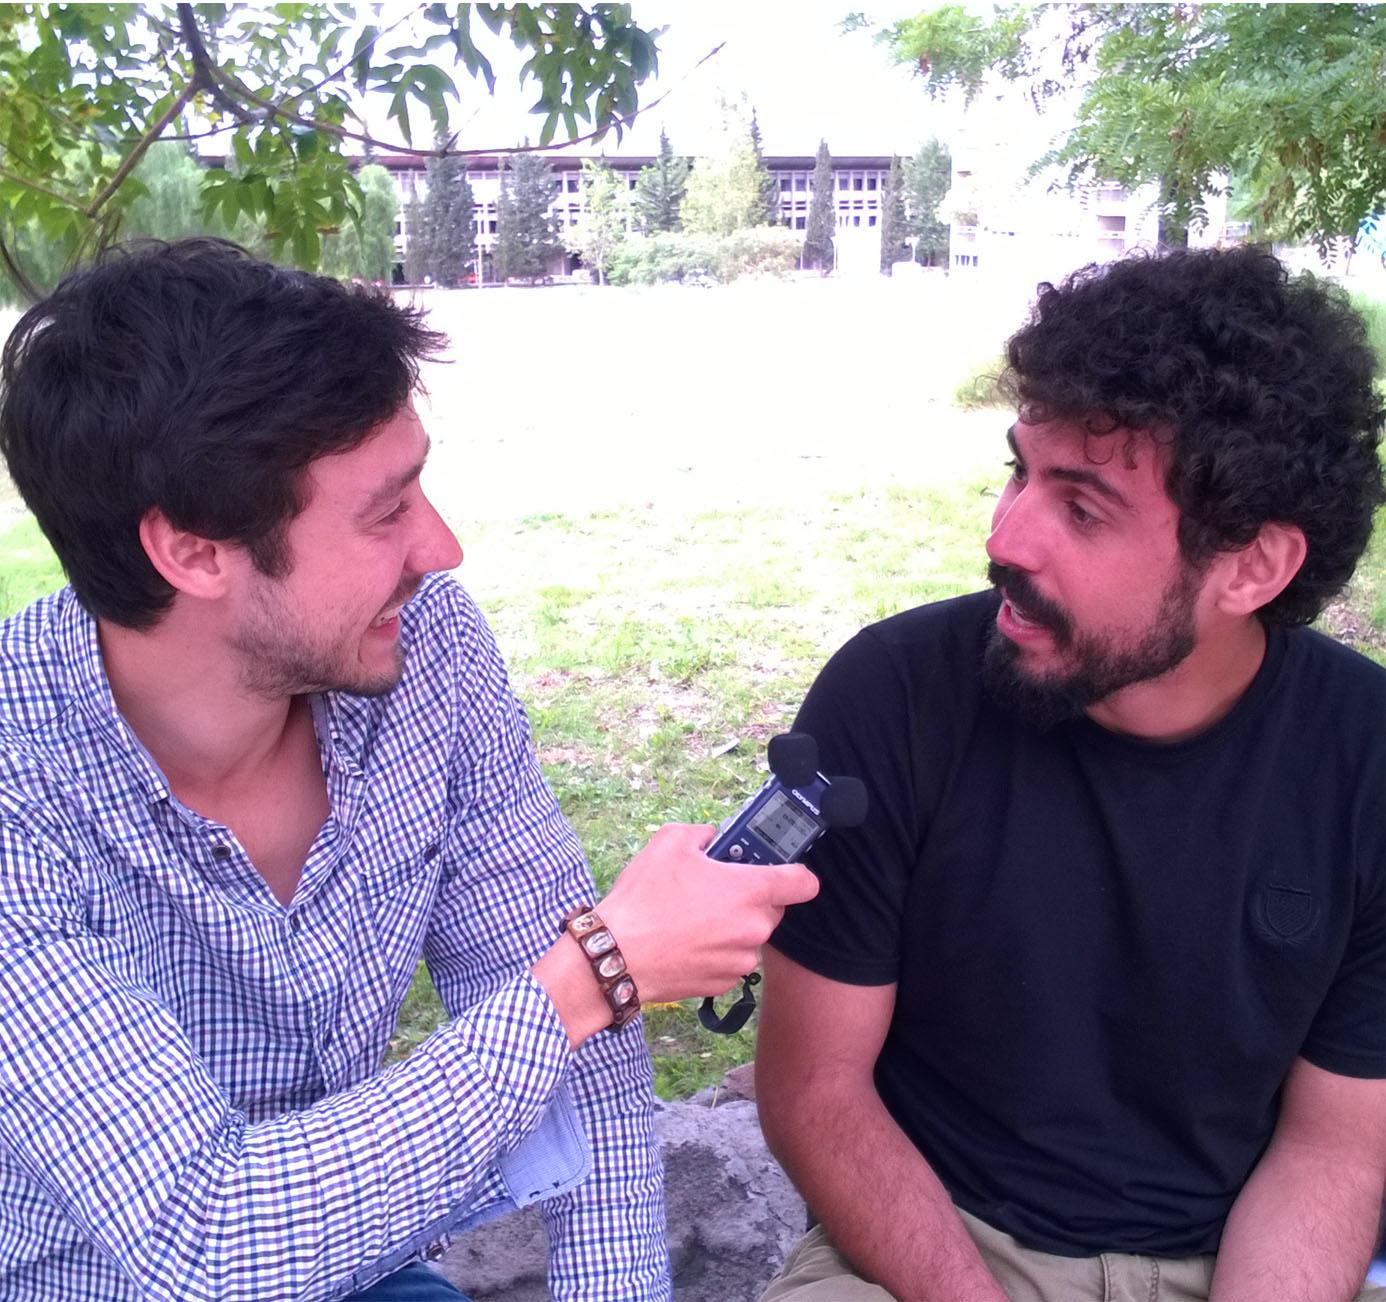 14 Jahre später: Andrés Begegnung mit ecke:sócrates